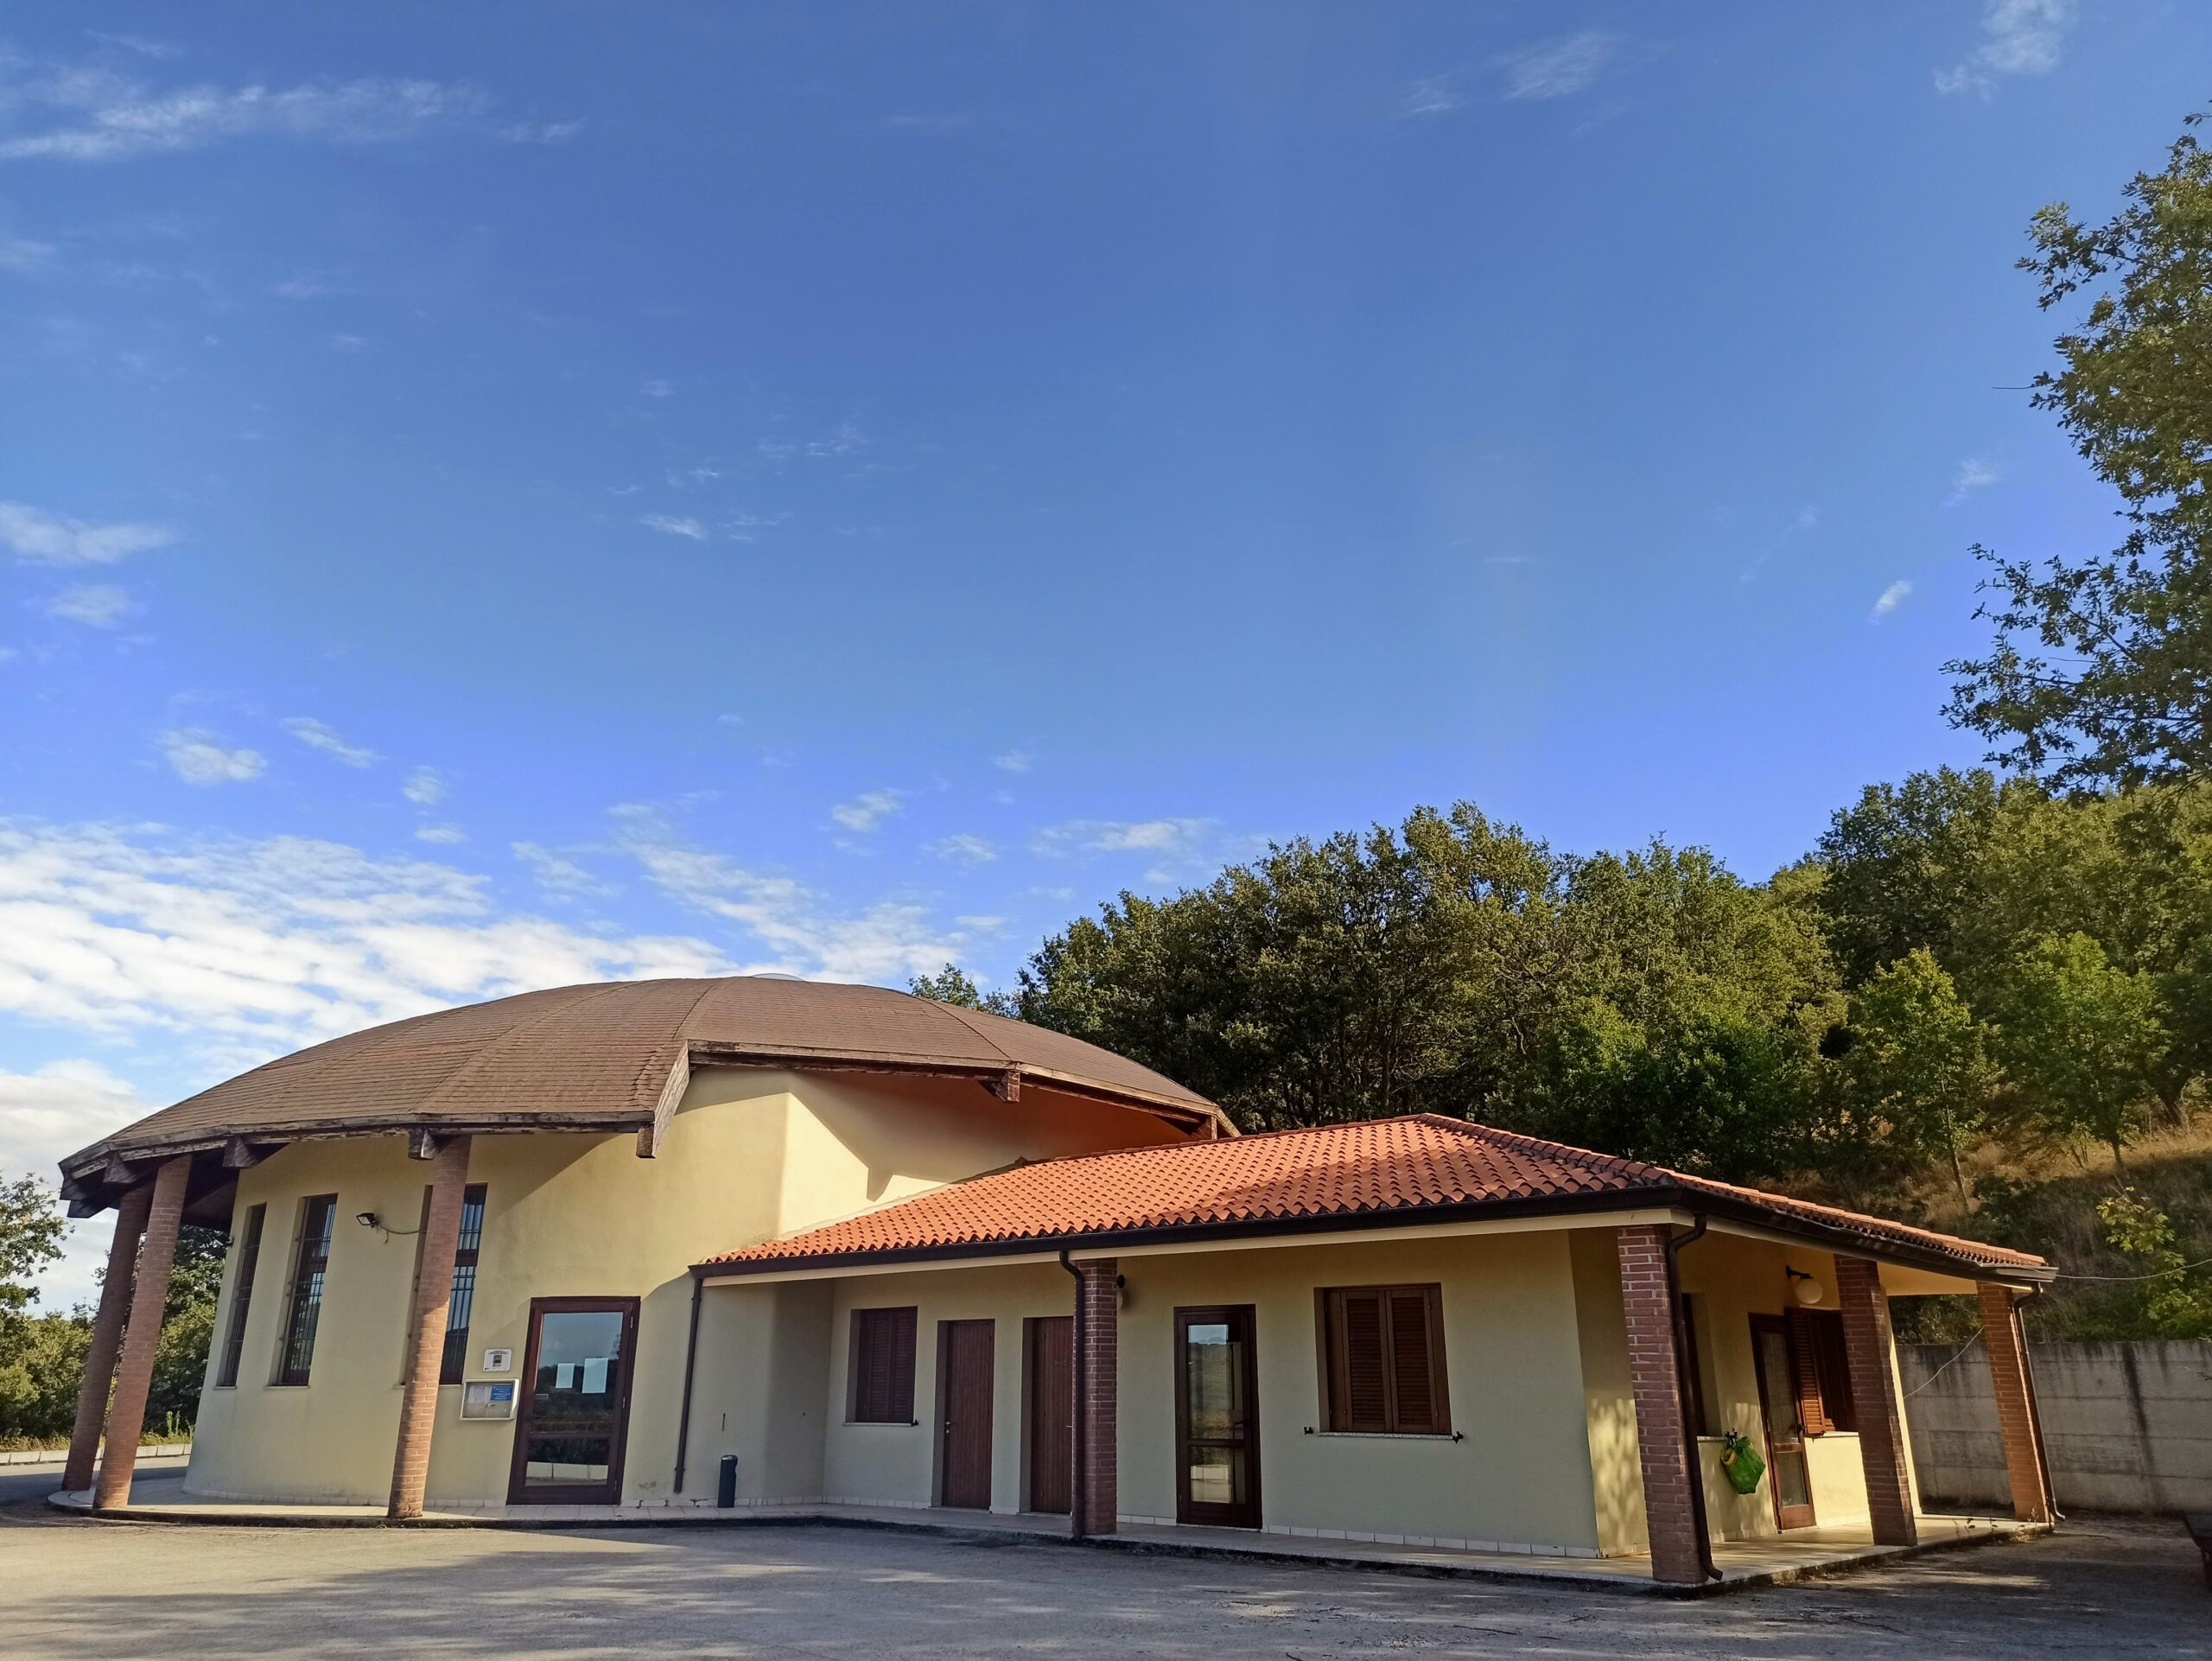 Orto Botanico Ollolai